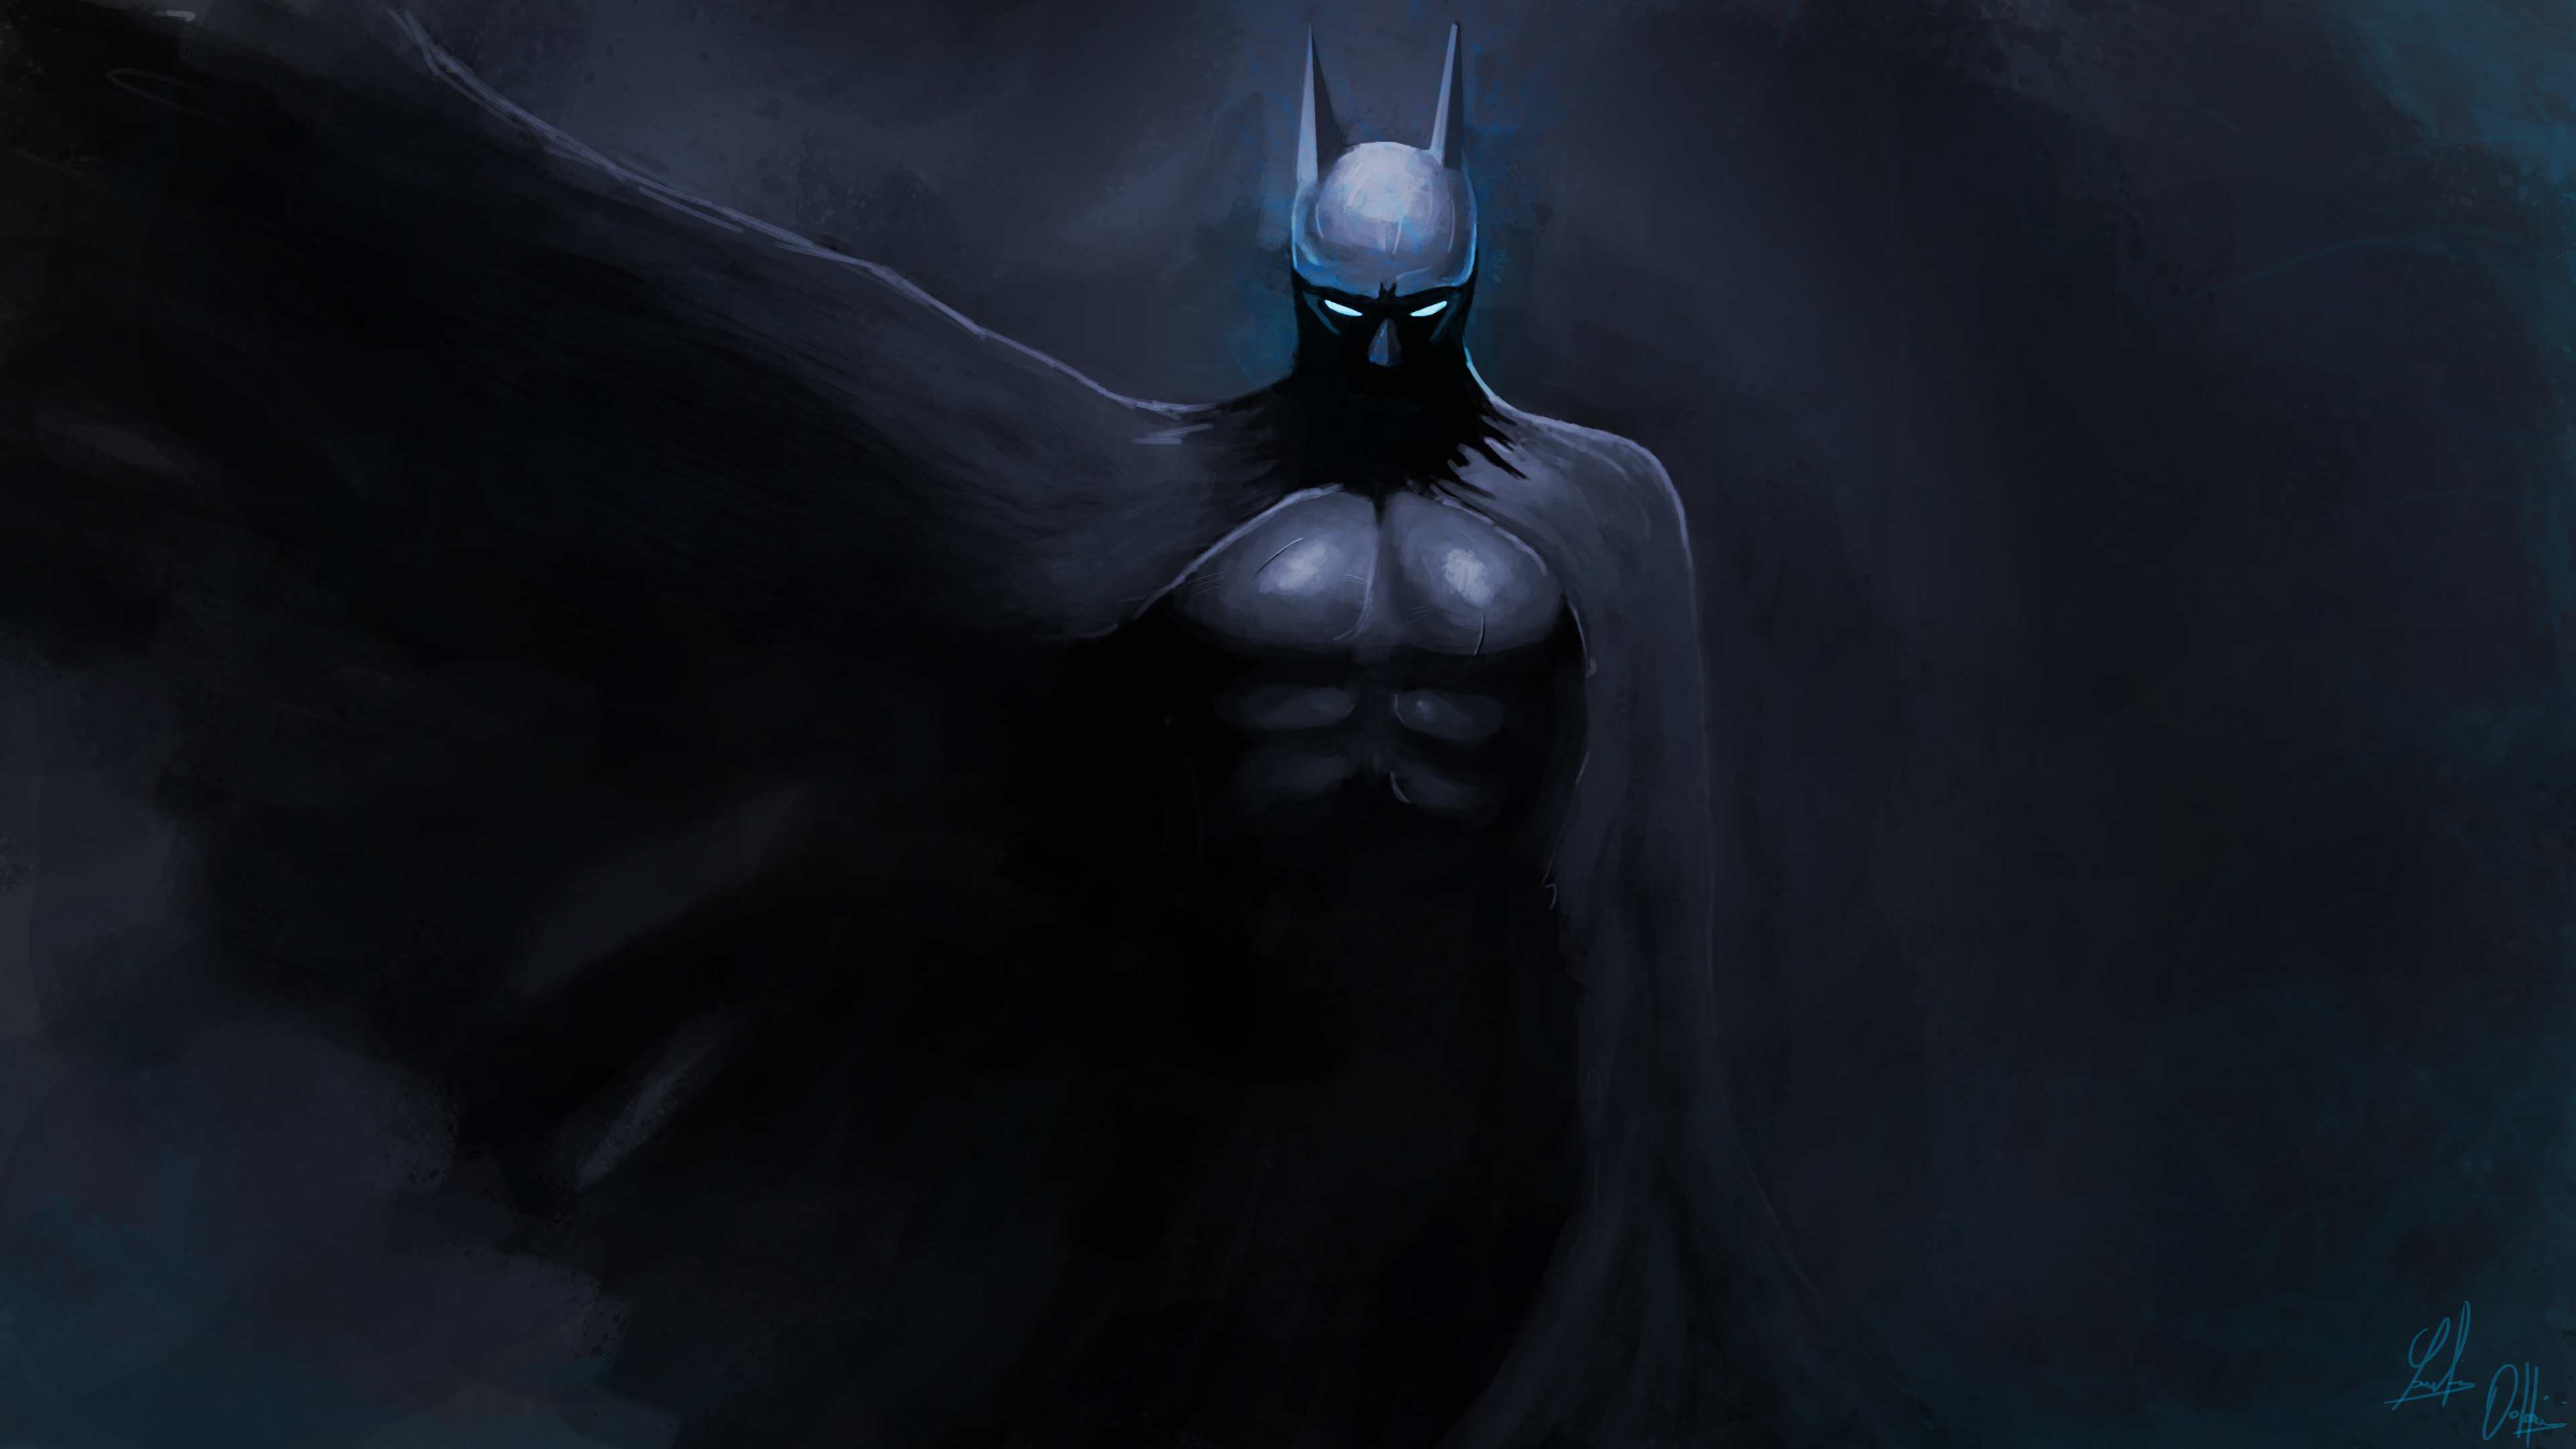 the dark knight 4k 1536522726 - The Dark Knight 4k - superheroes wallpapers, hd-wallpapers, digital art wallpapers, deviantart wallpapers, batman wallpapers, artwork wallpapers, artist wallpapers, 4k-wallpapers